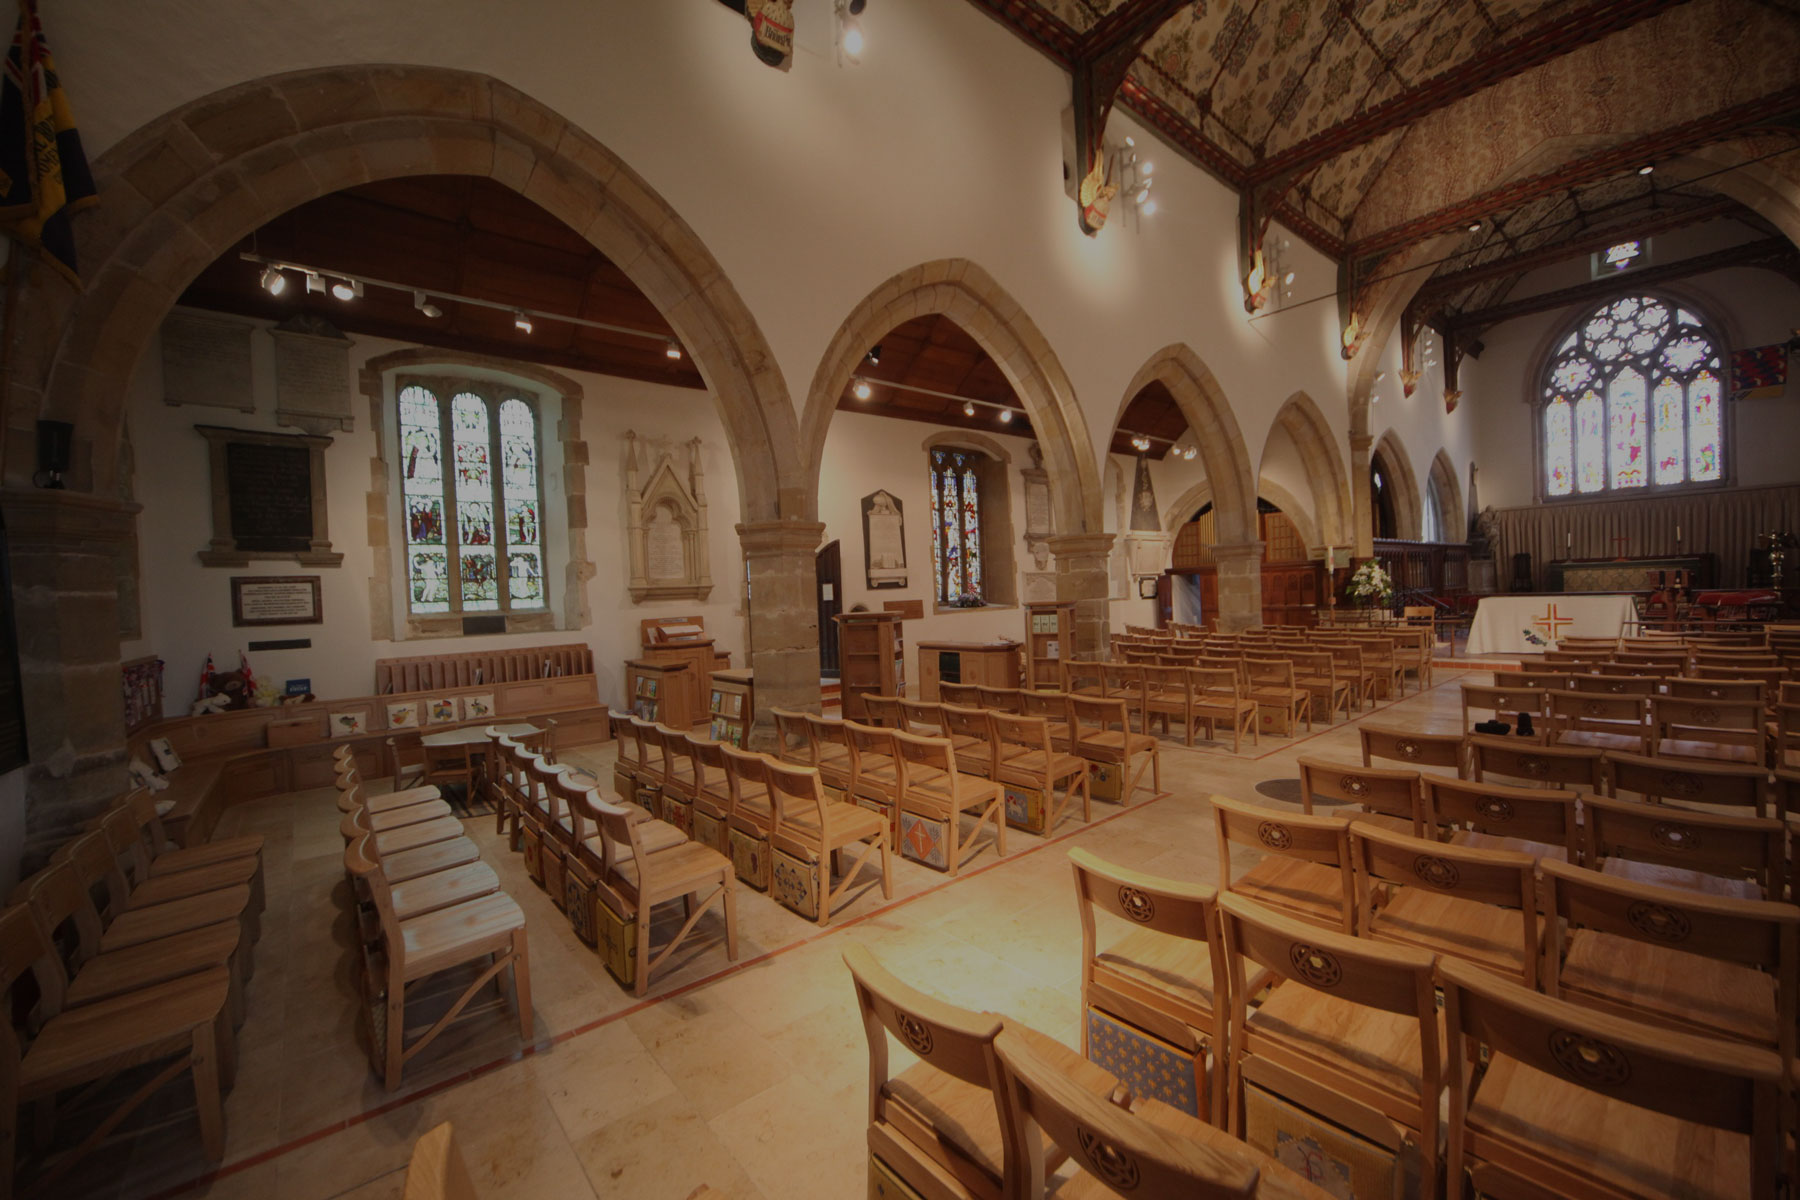 ICS project in the Holy Trinity Church, Cuckfield